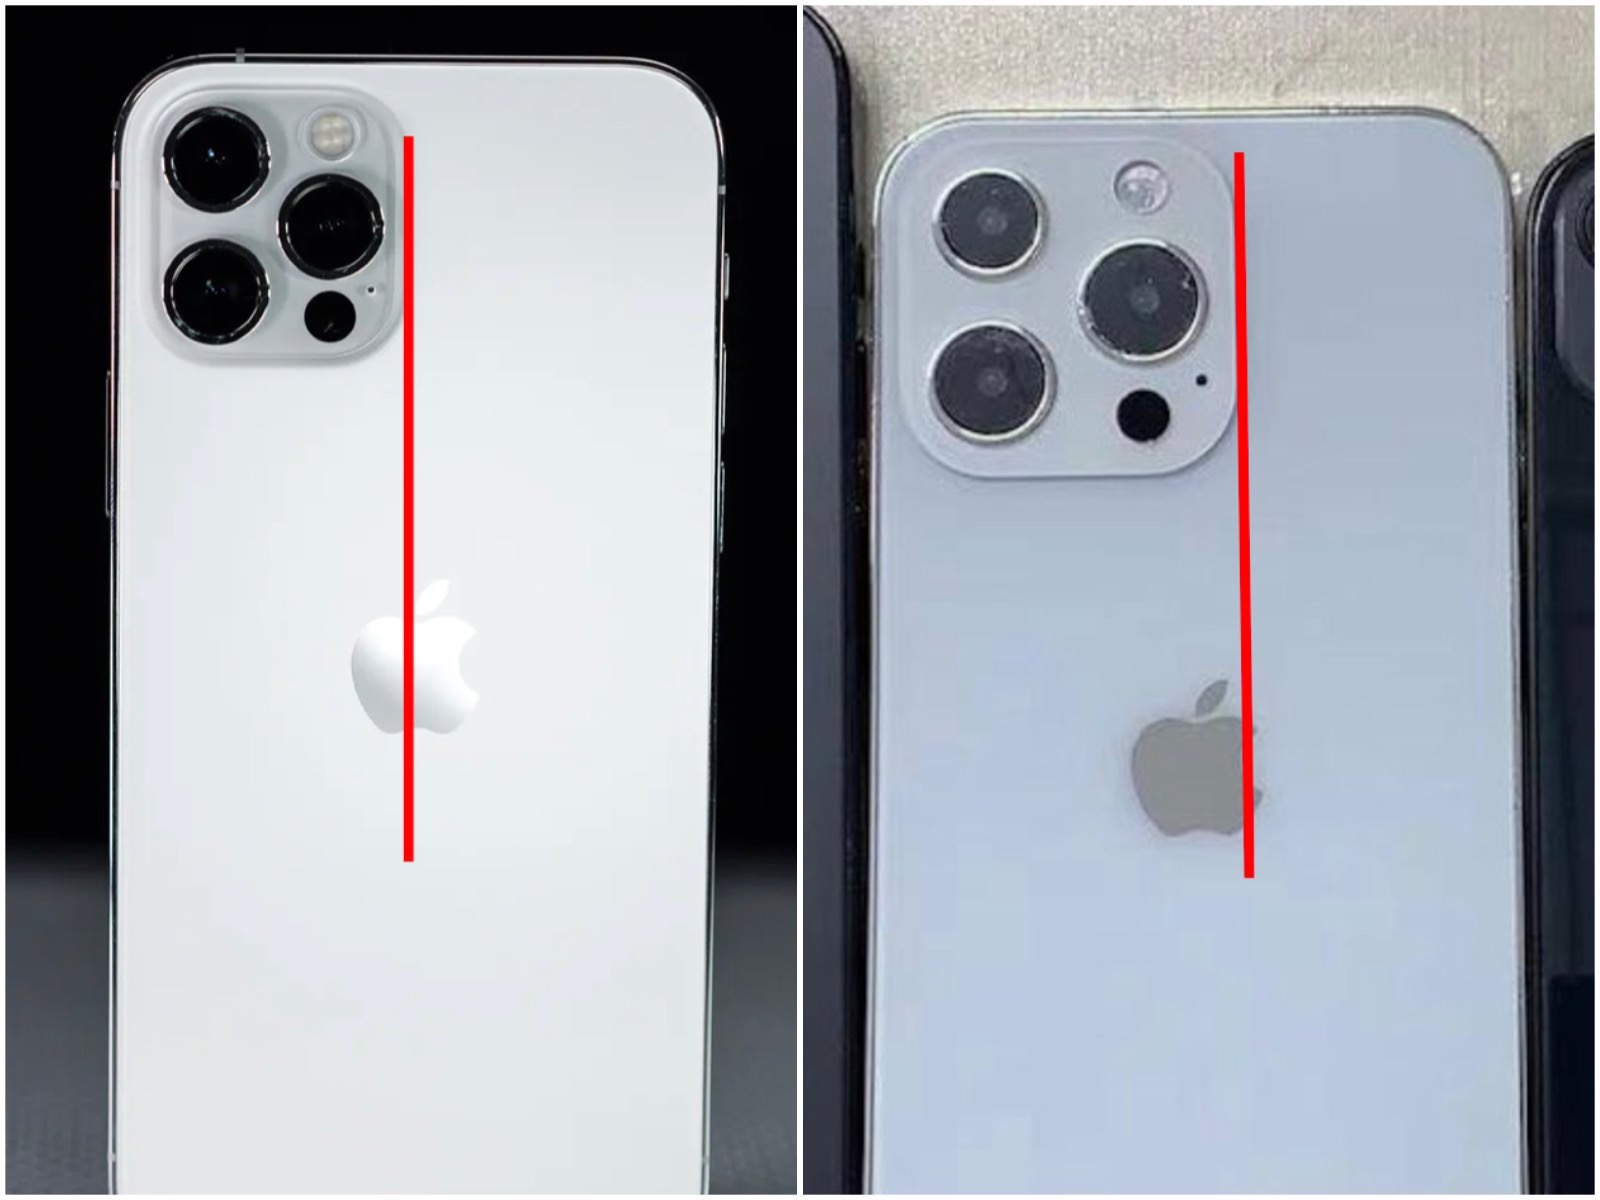 Iphone13pro vs 12pro camera unit size